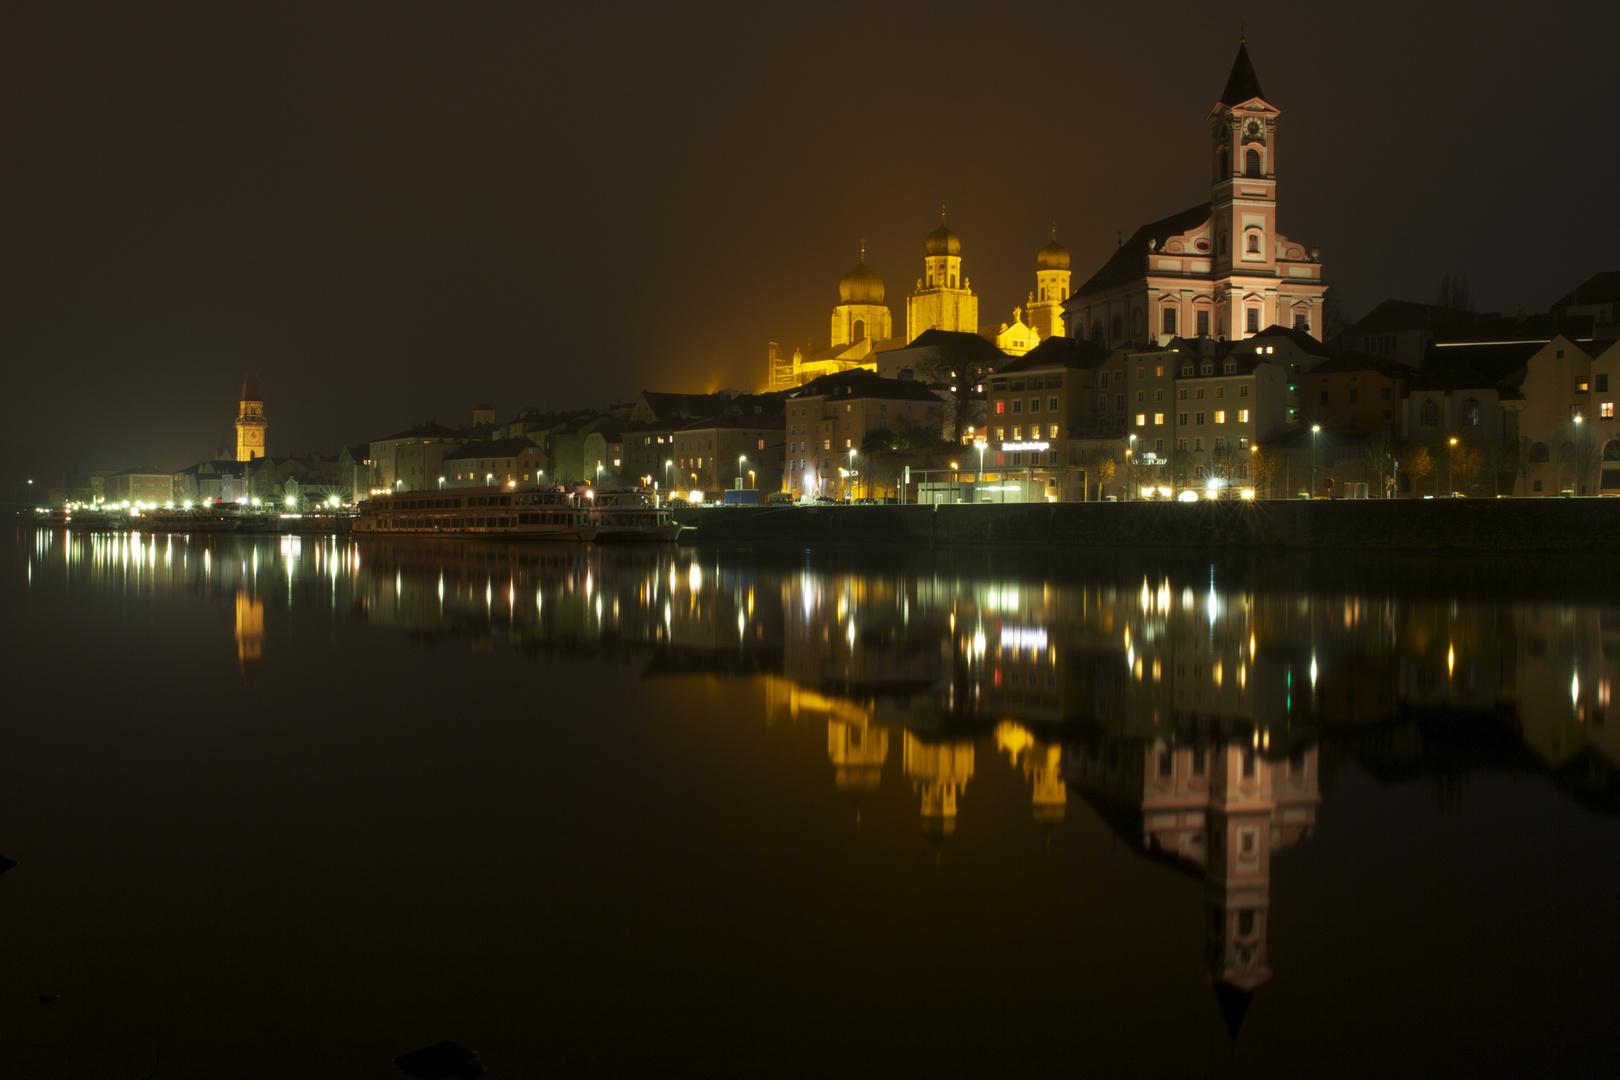 Nachtaufnahme Passau November 2012